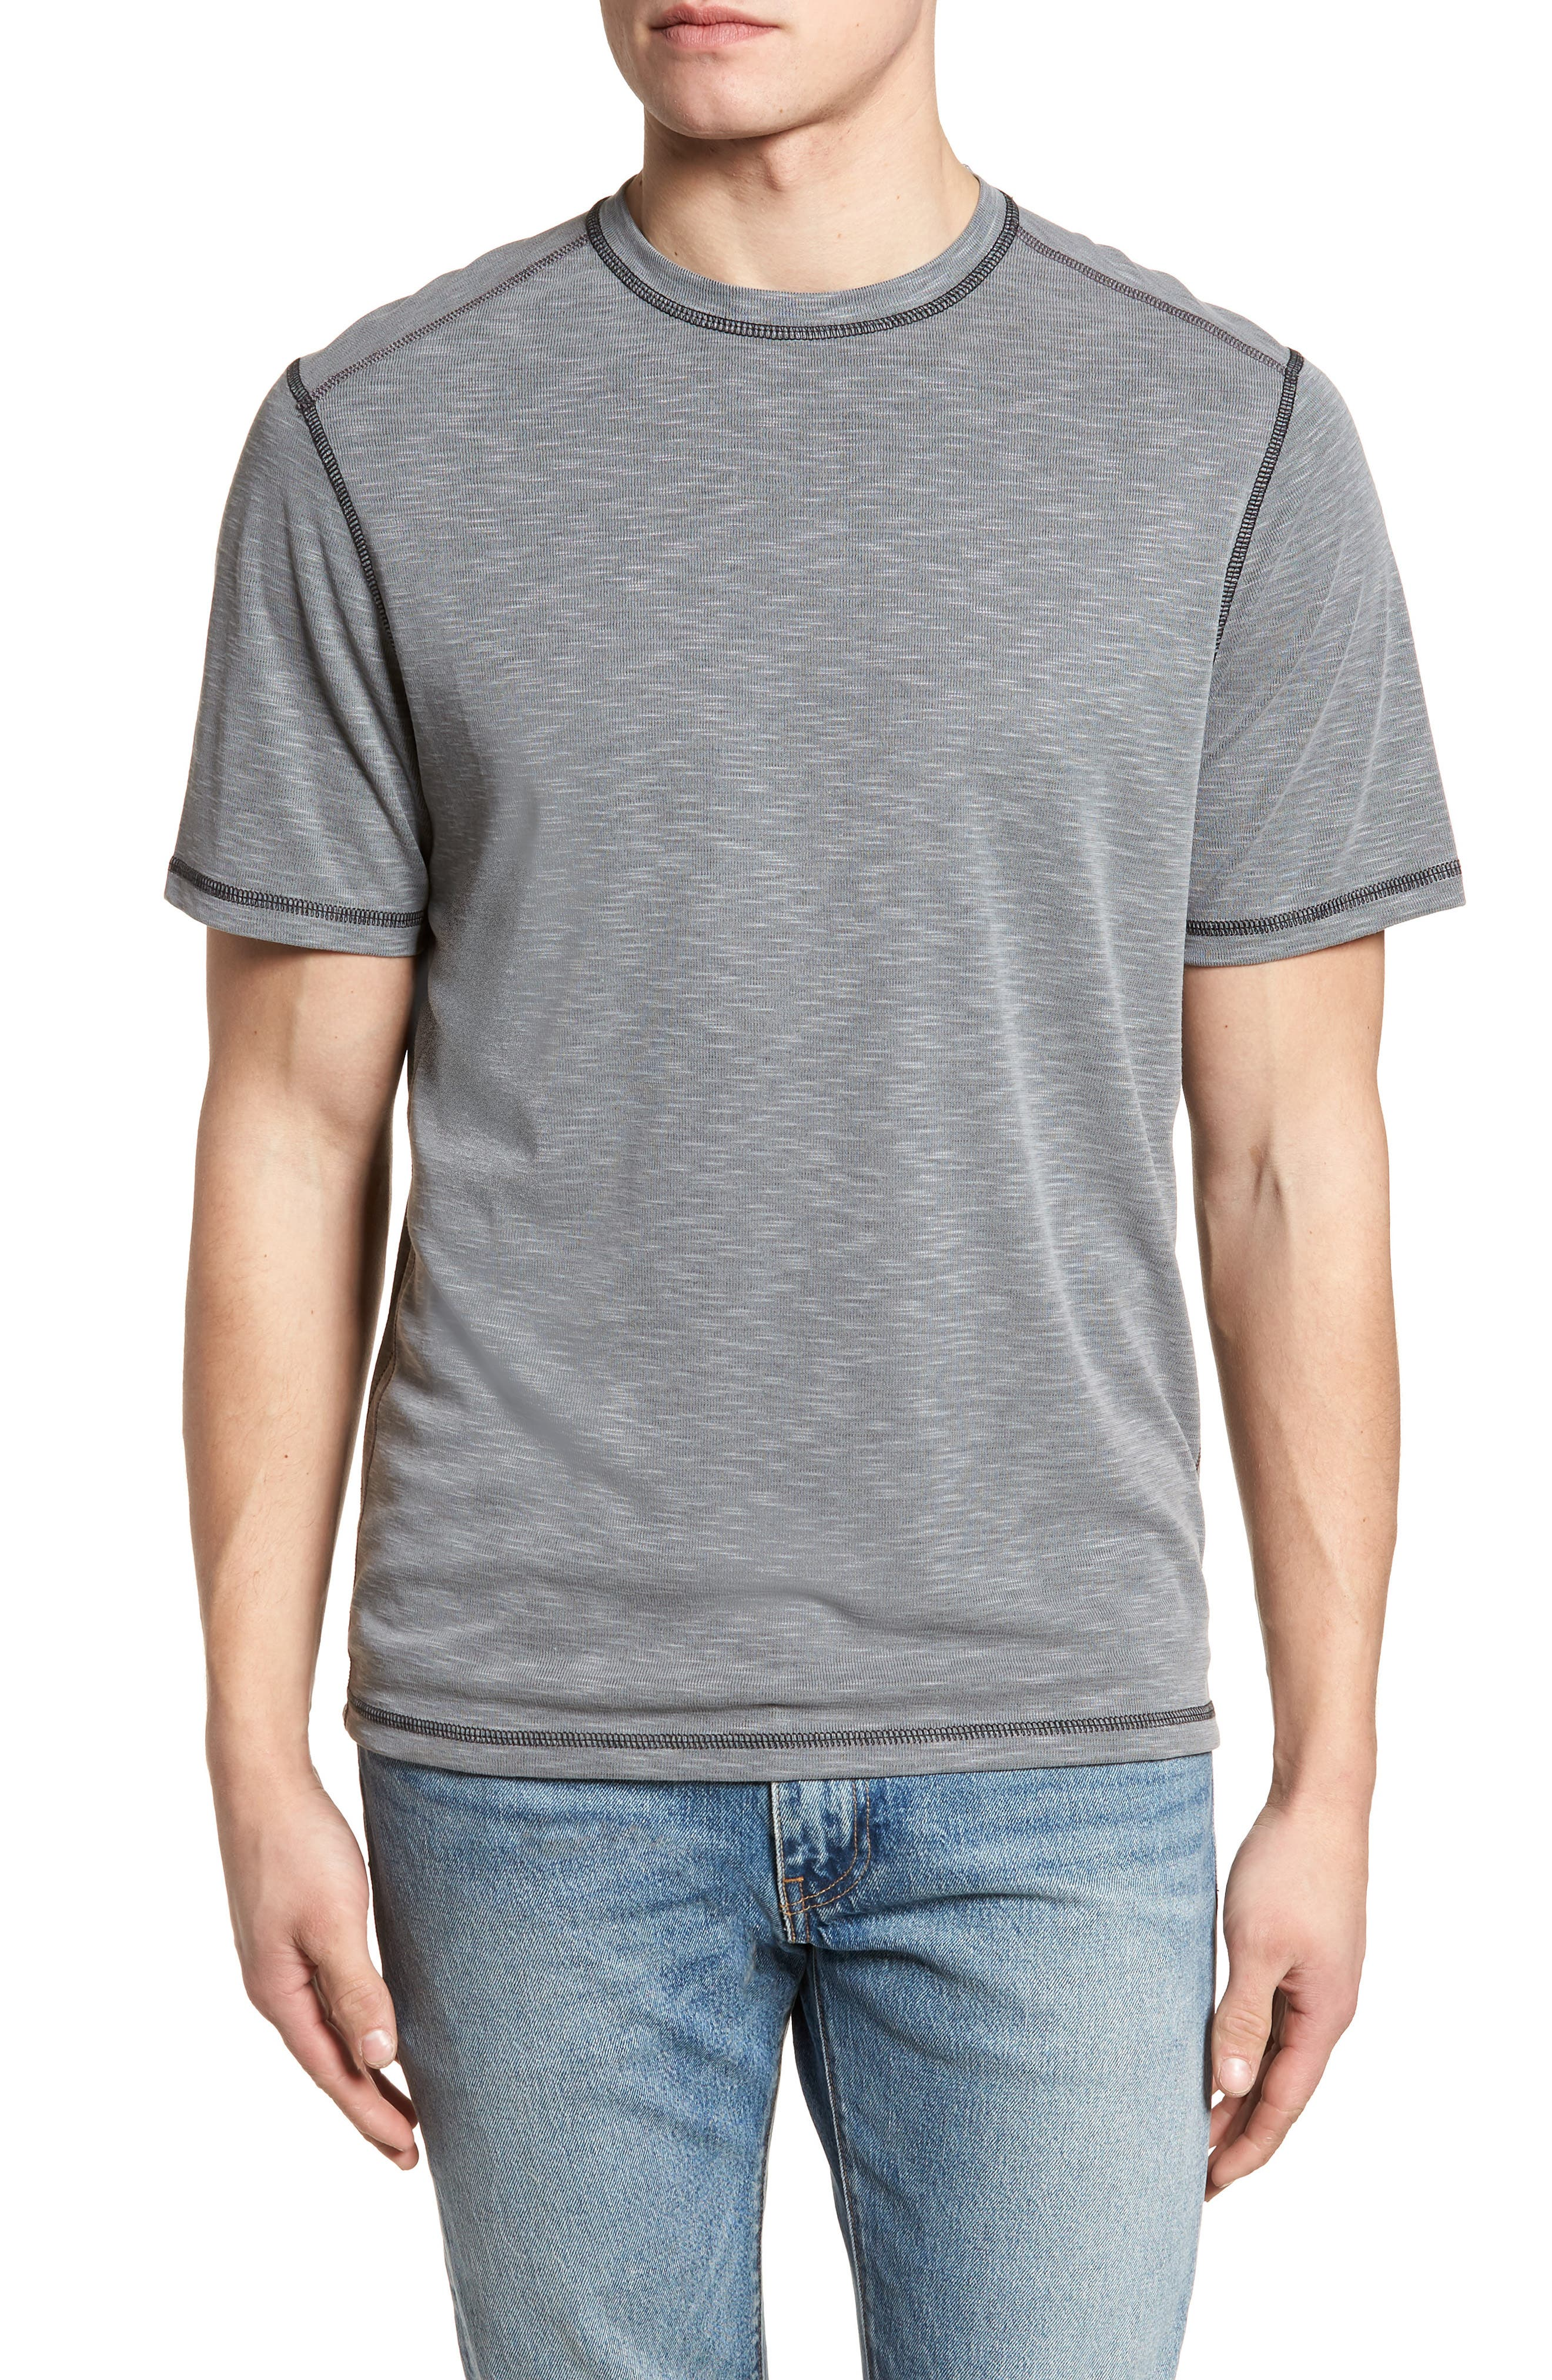 Flip Tide T-Shirt,                             Main thumbnail 1, color,                             COAL